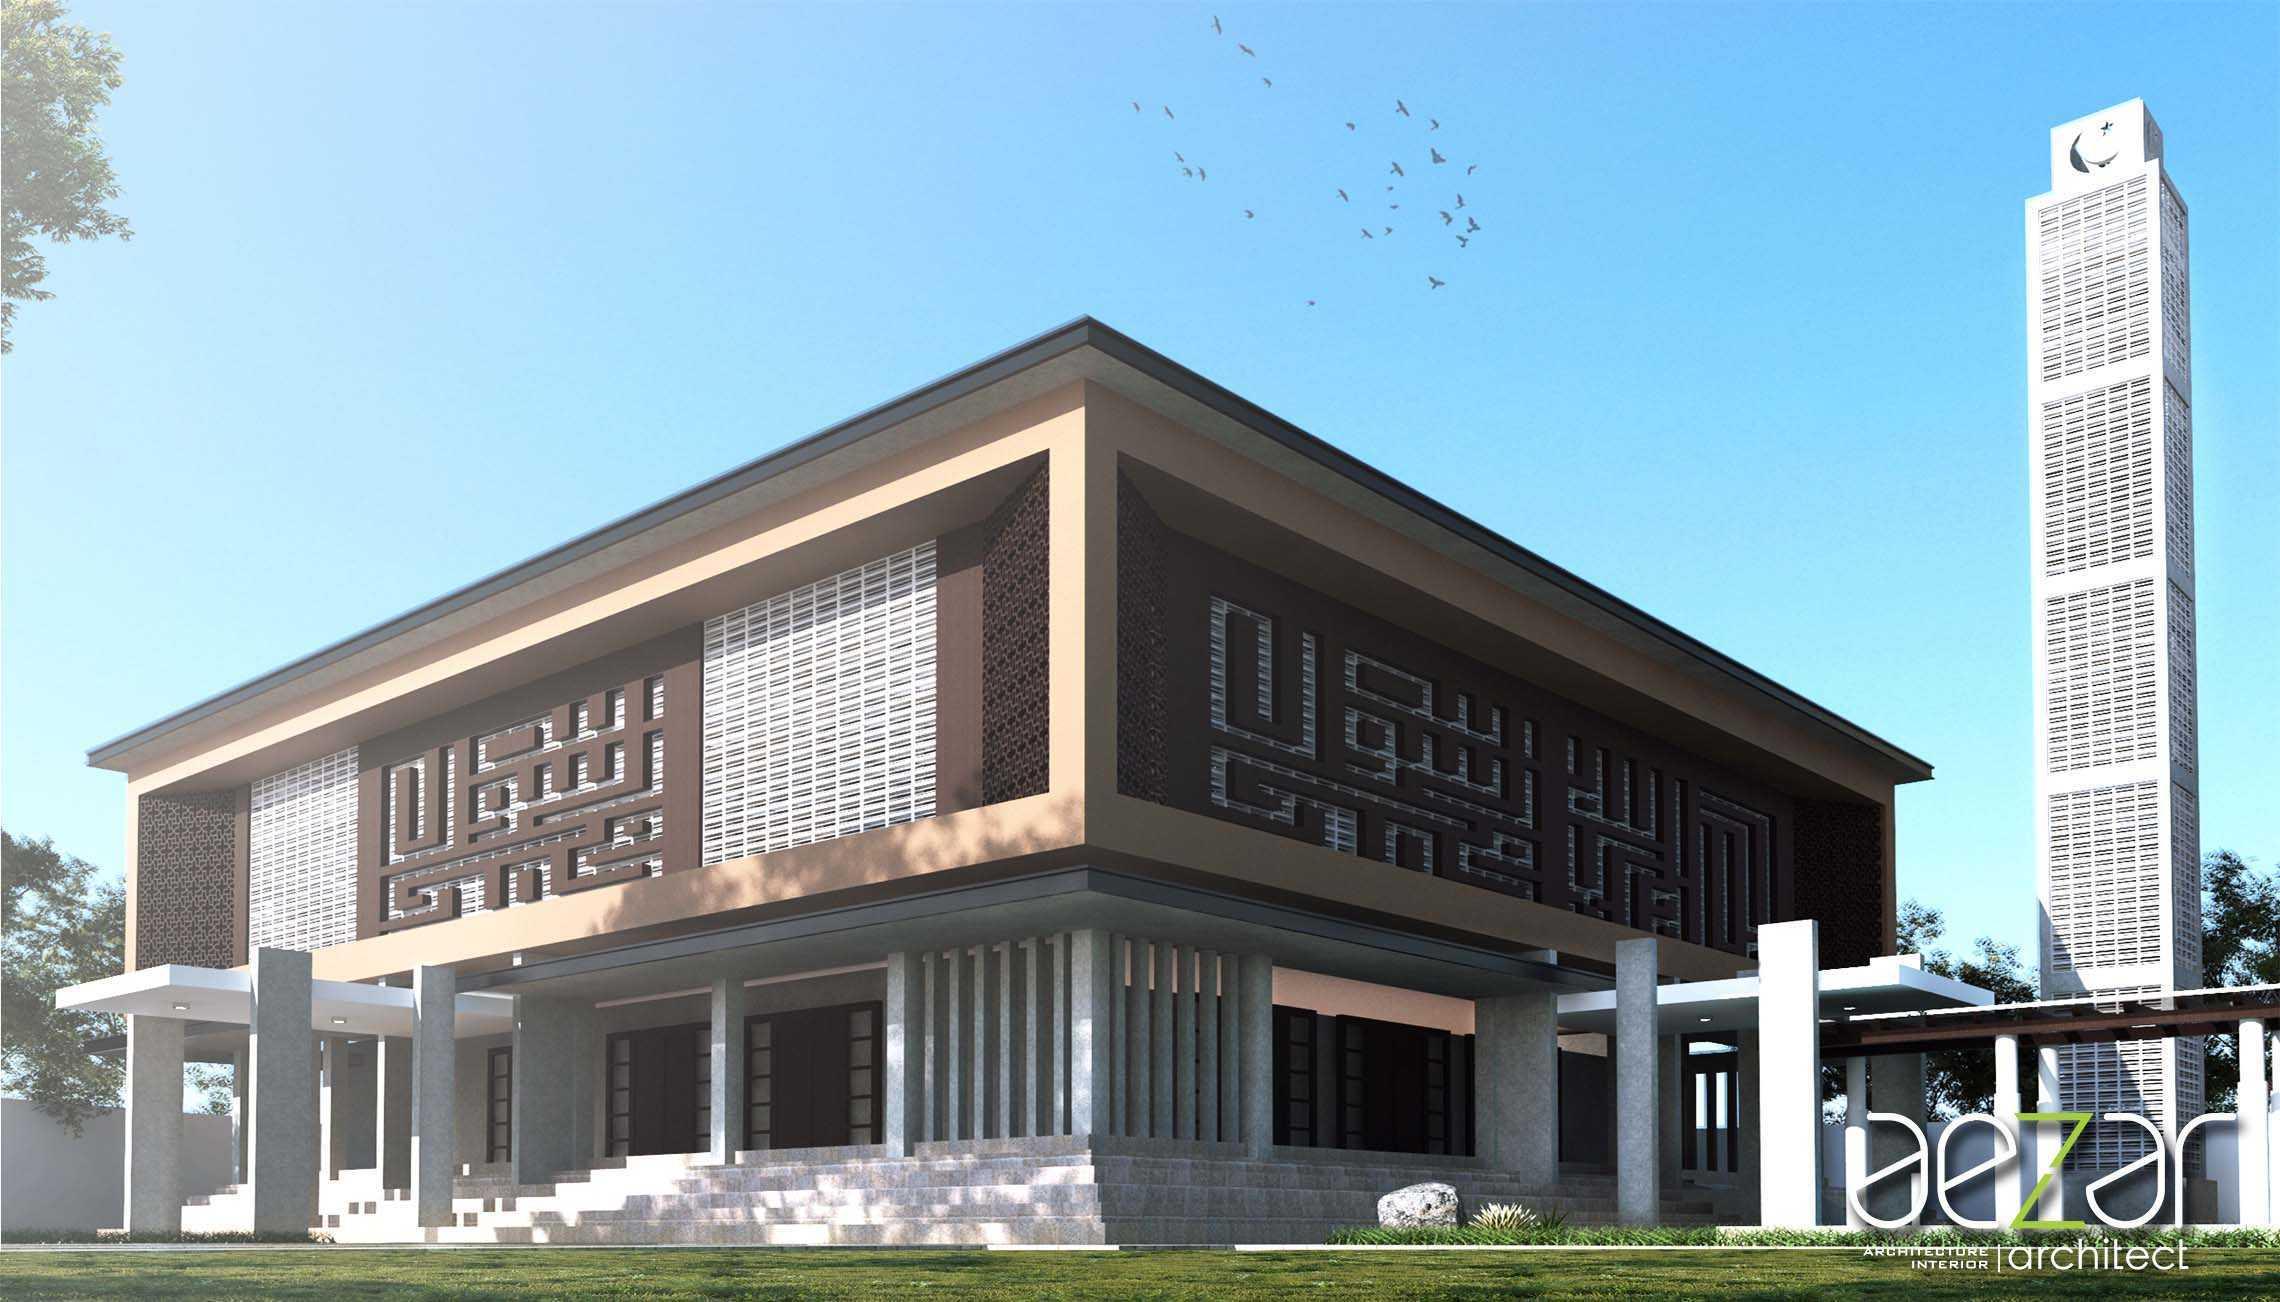 Aezar Architect Masjid Hasyim Asy'ari Kabupaten Cilacap, Jawa Tengah, Indonesia Kabupaten Cilacap, Jawa Tengah, Indonesia Exterior View   54441